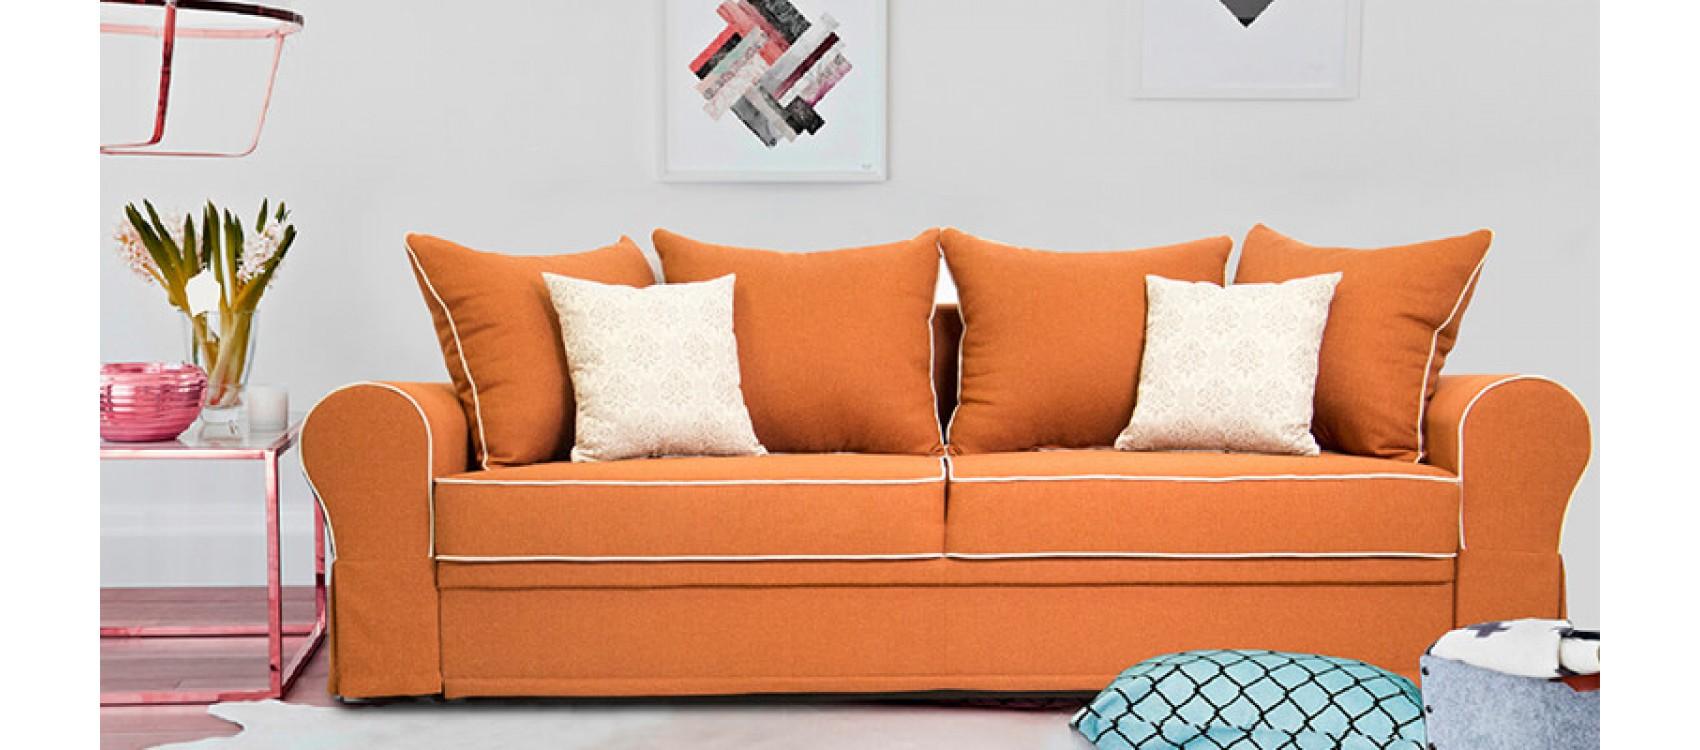 Sofa ALICE фото 1